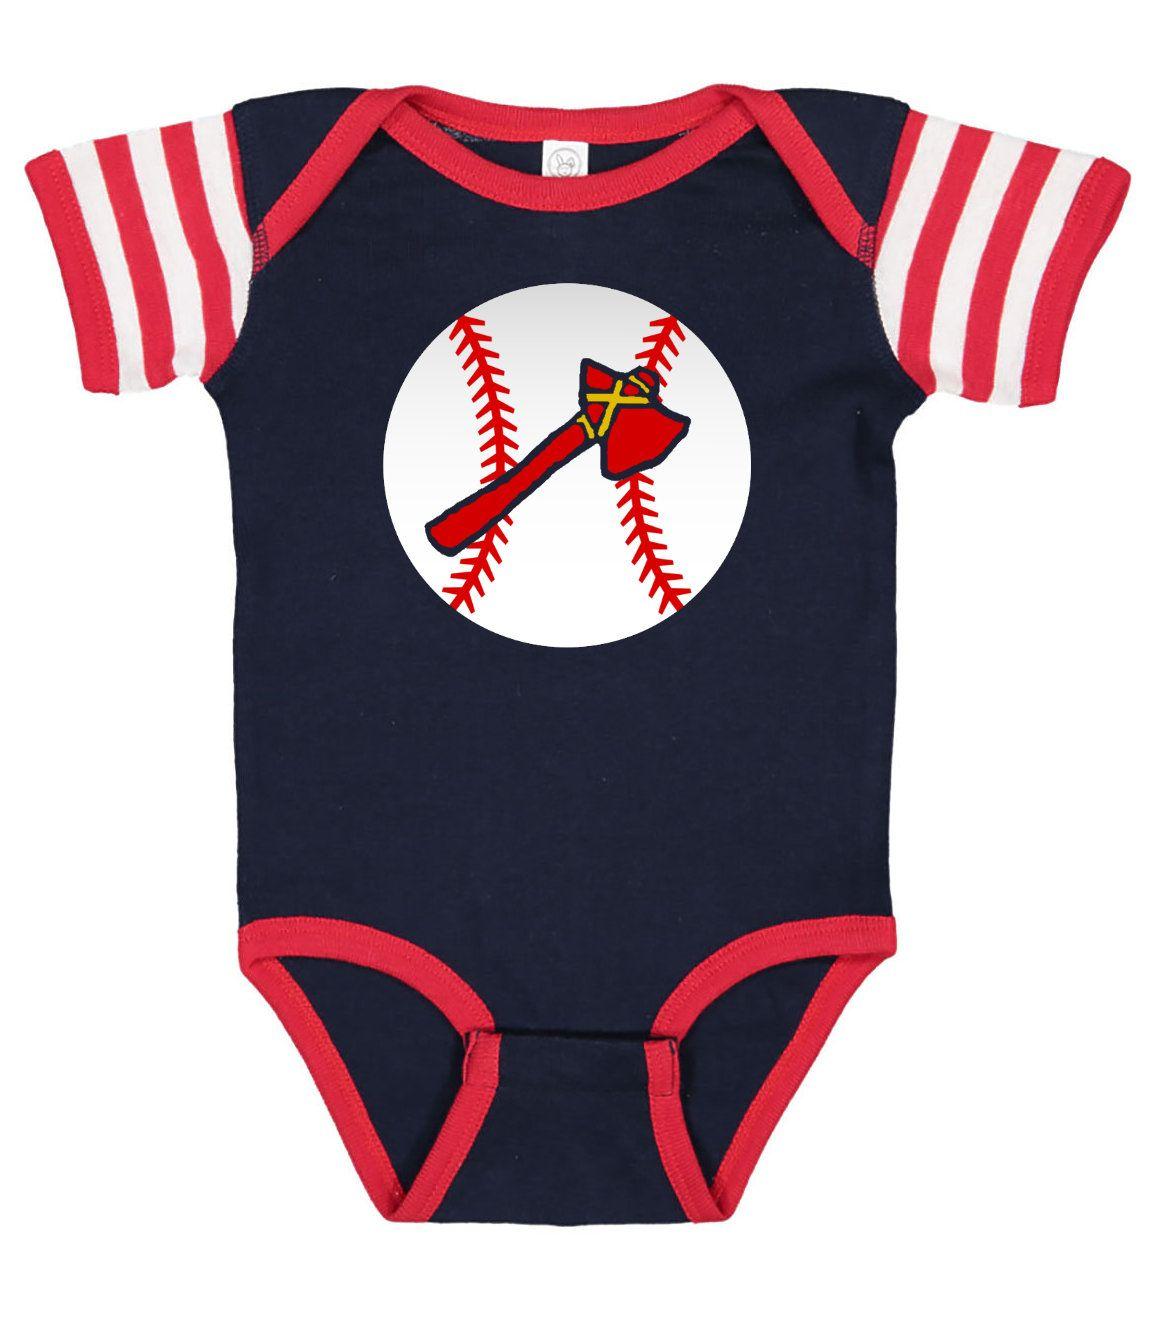 Atlanta Braves Inspired Bodysuit For Baby Etsy Atlanta Braves Baseball Outfit Gameday Dress